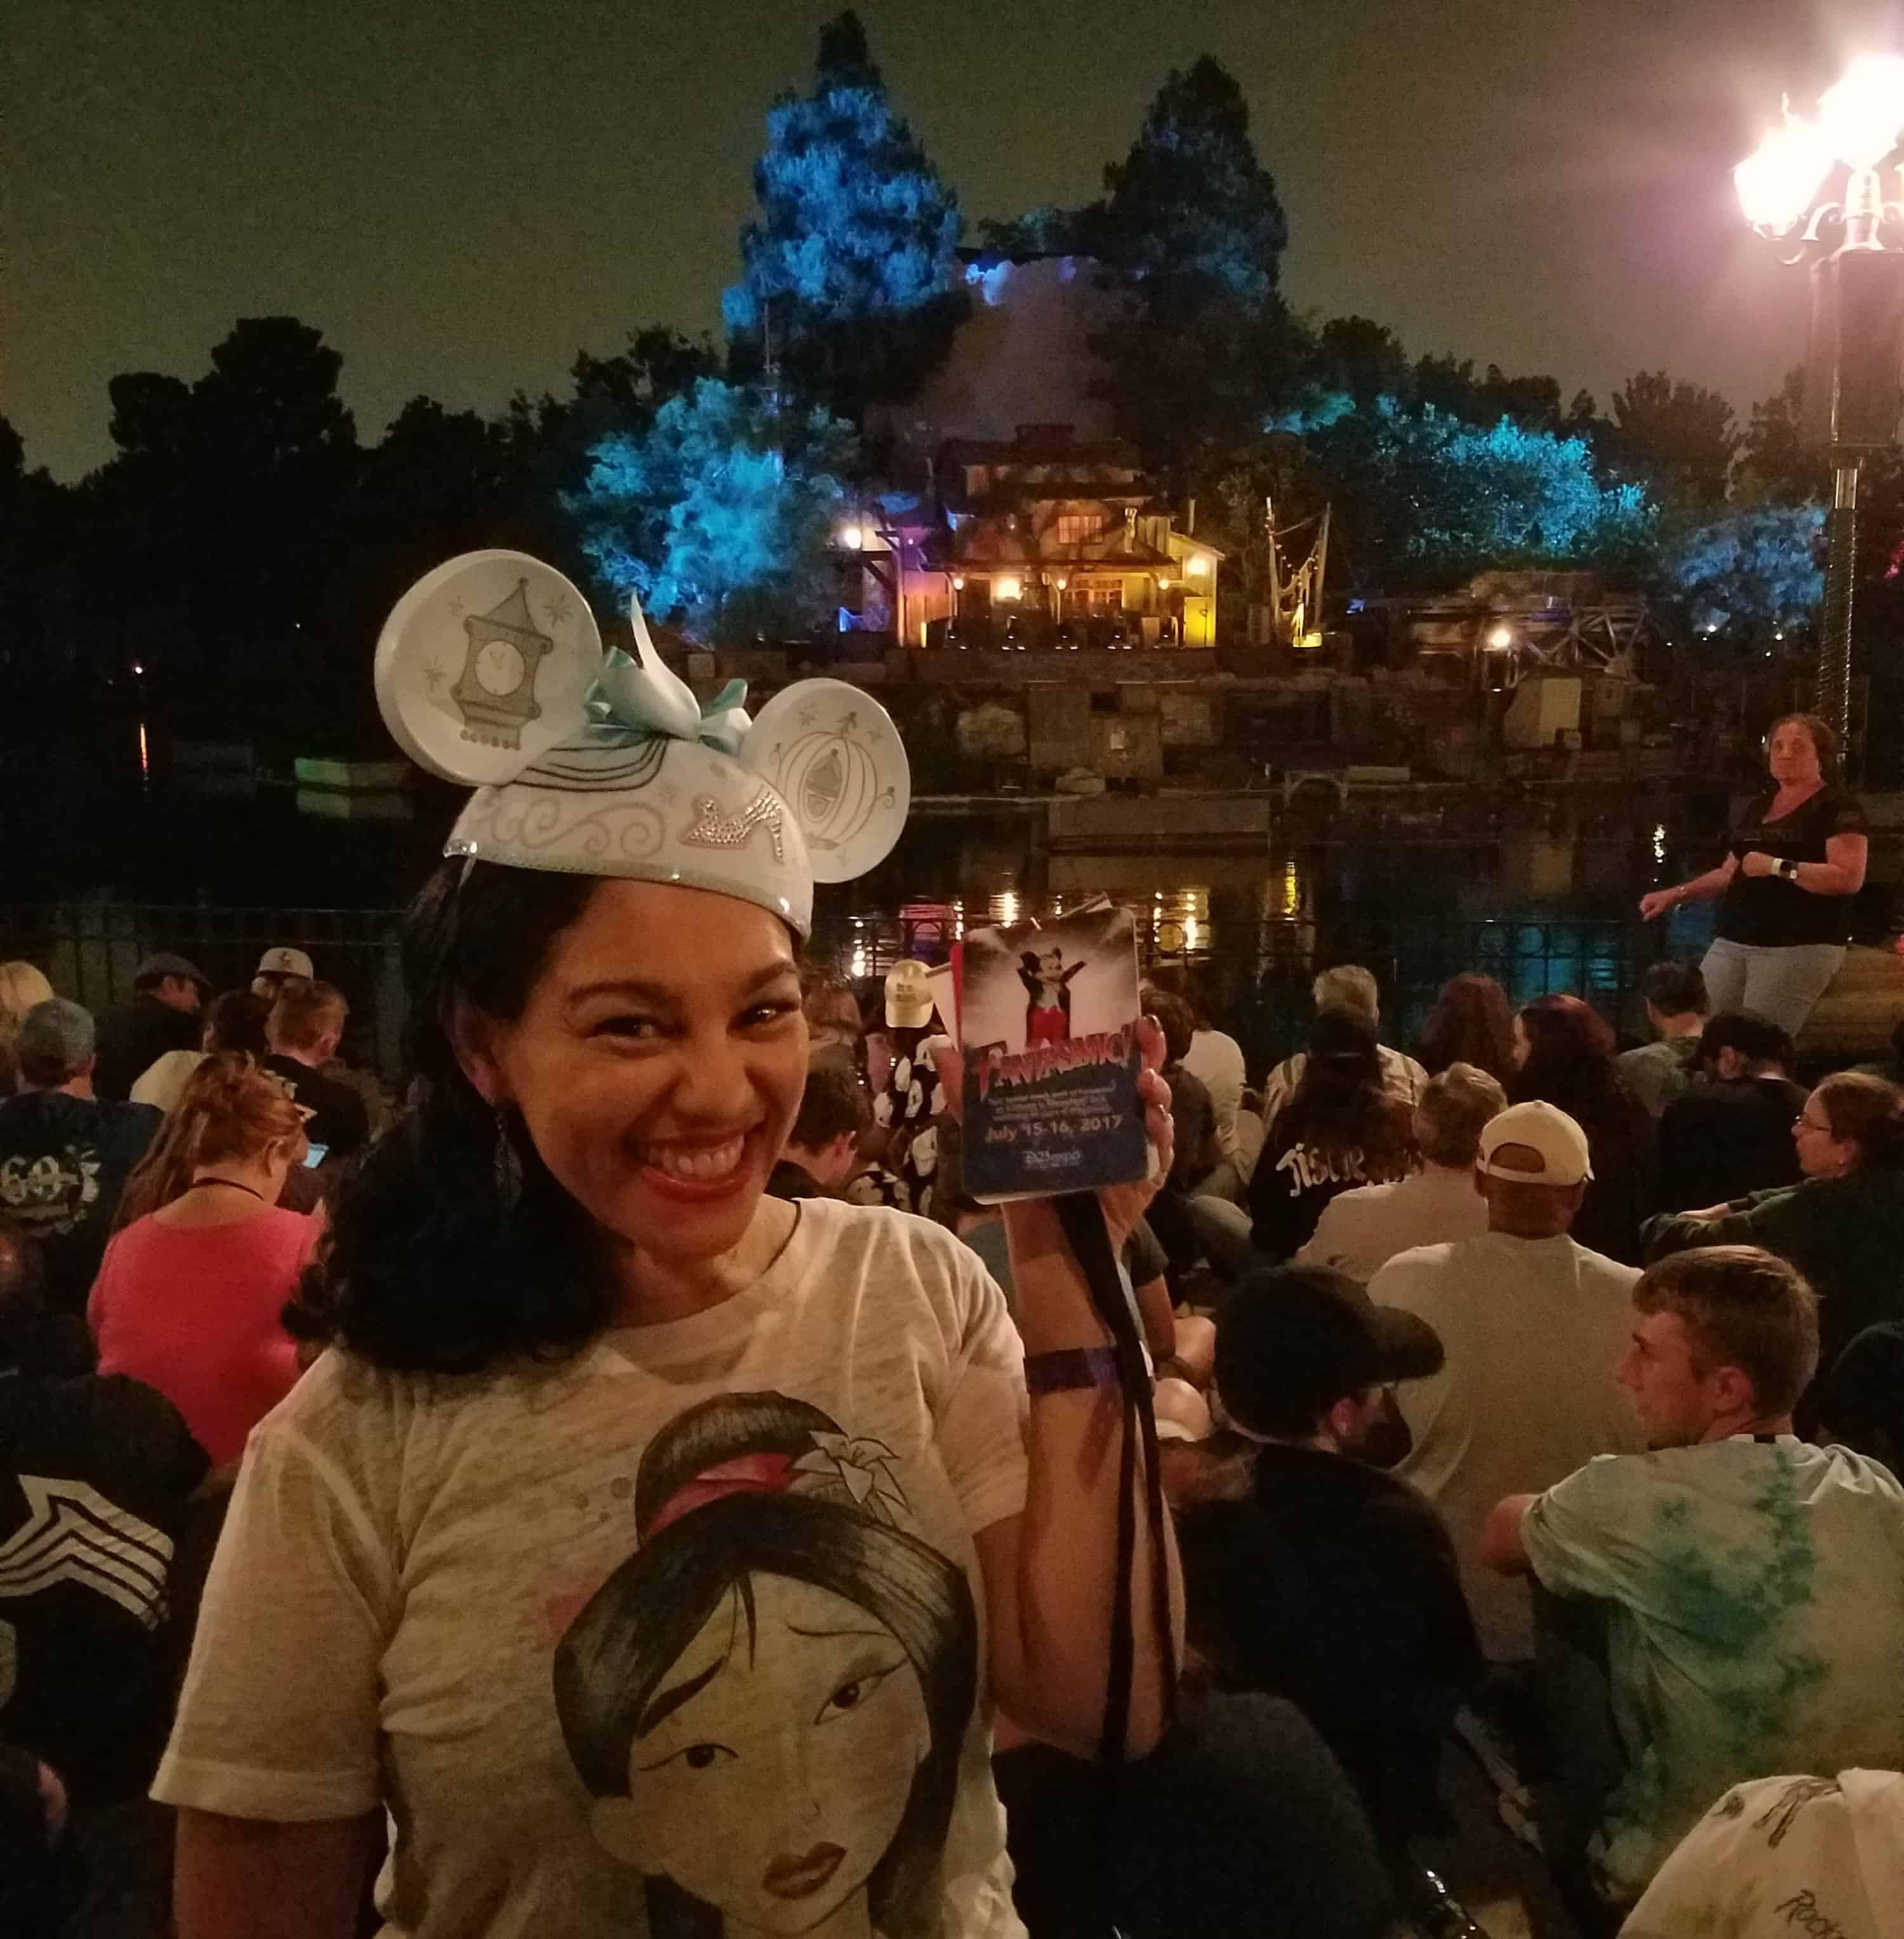 While at D23 Expo - Disneyland and Disney California Adventure - Fantasmic